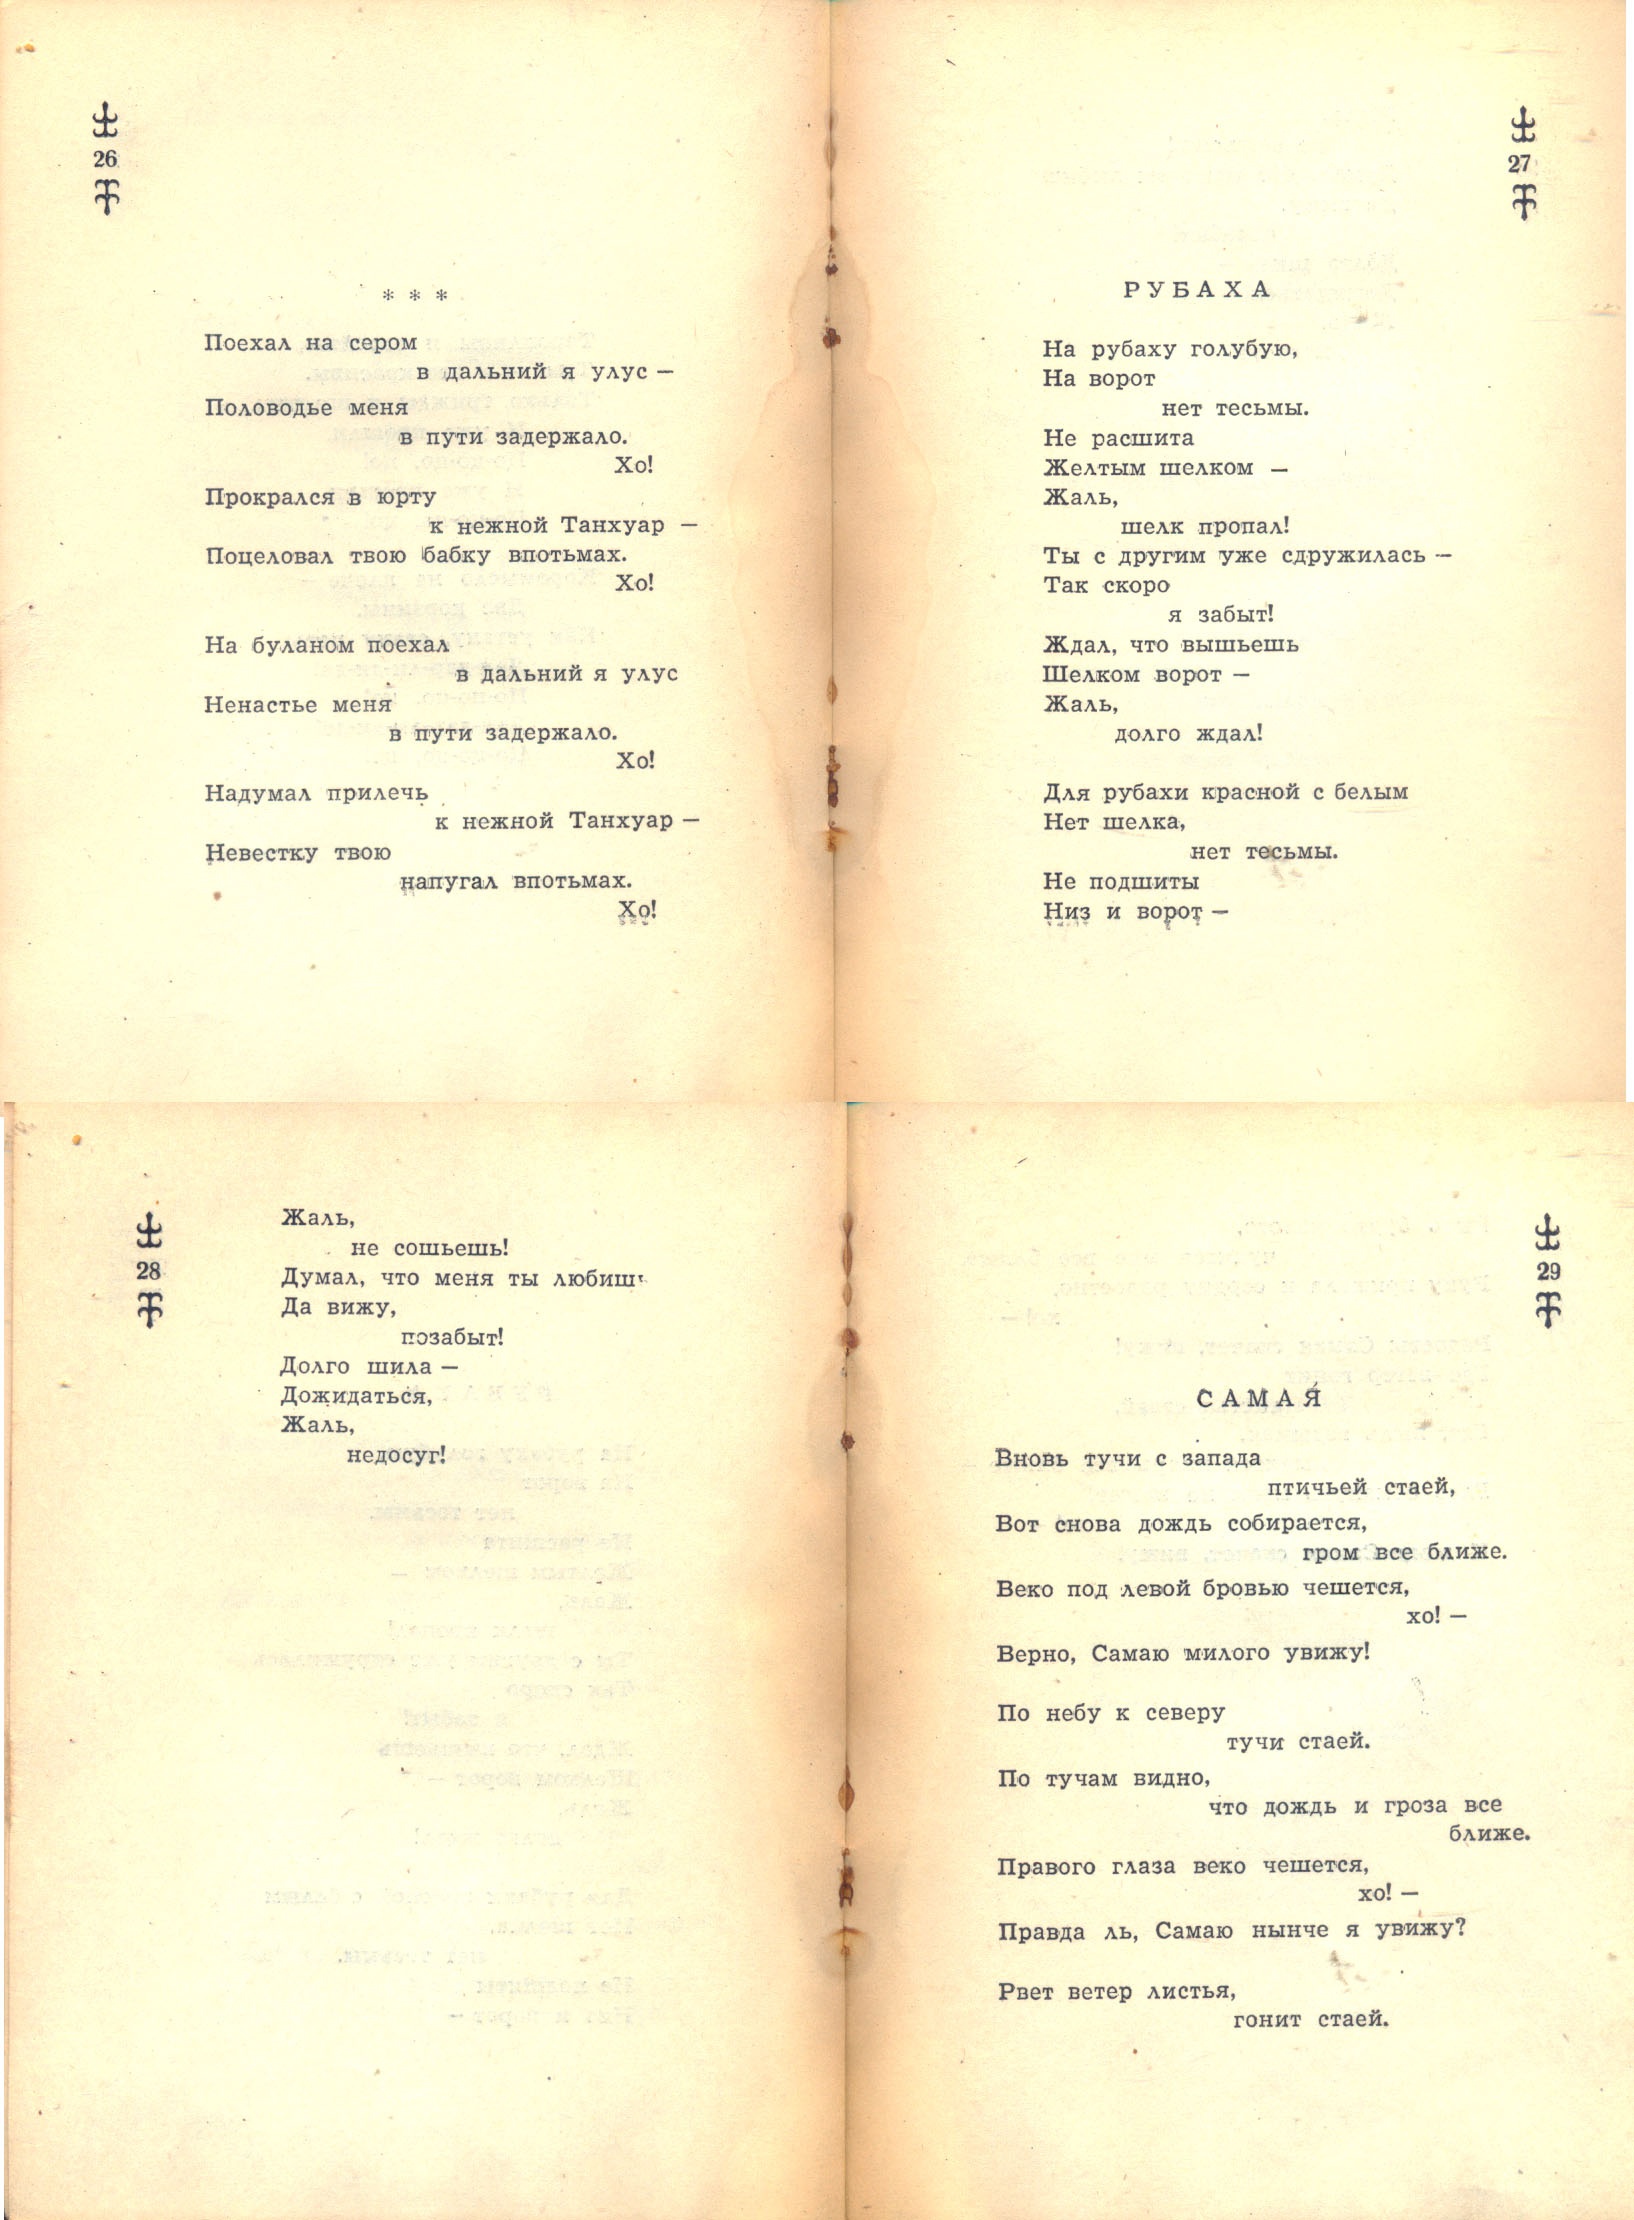 Песни 26-29.jpg